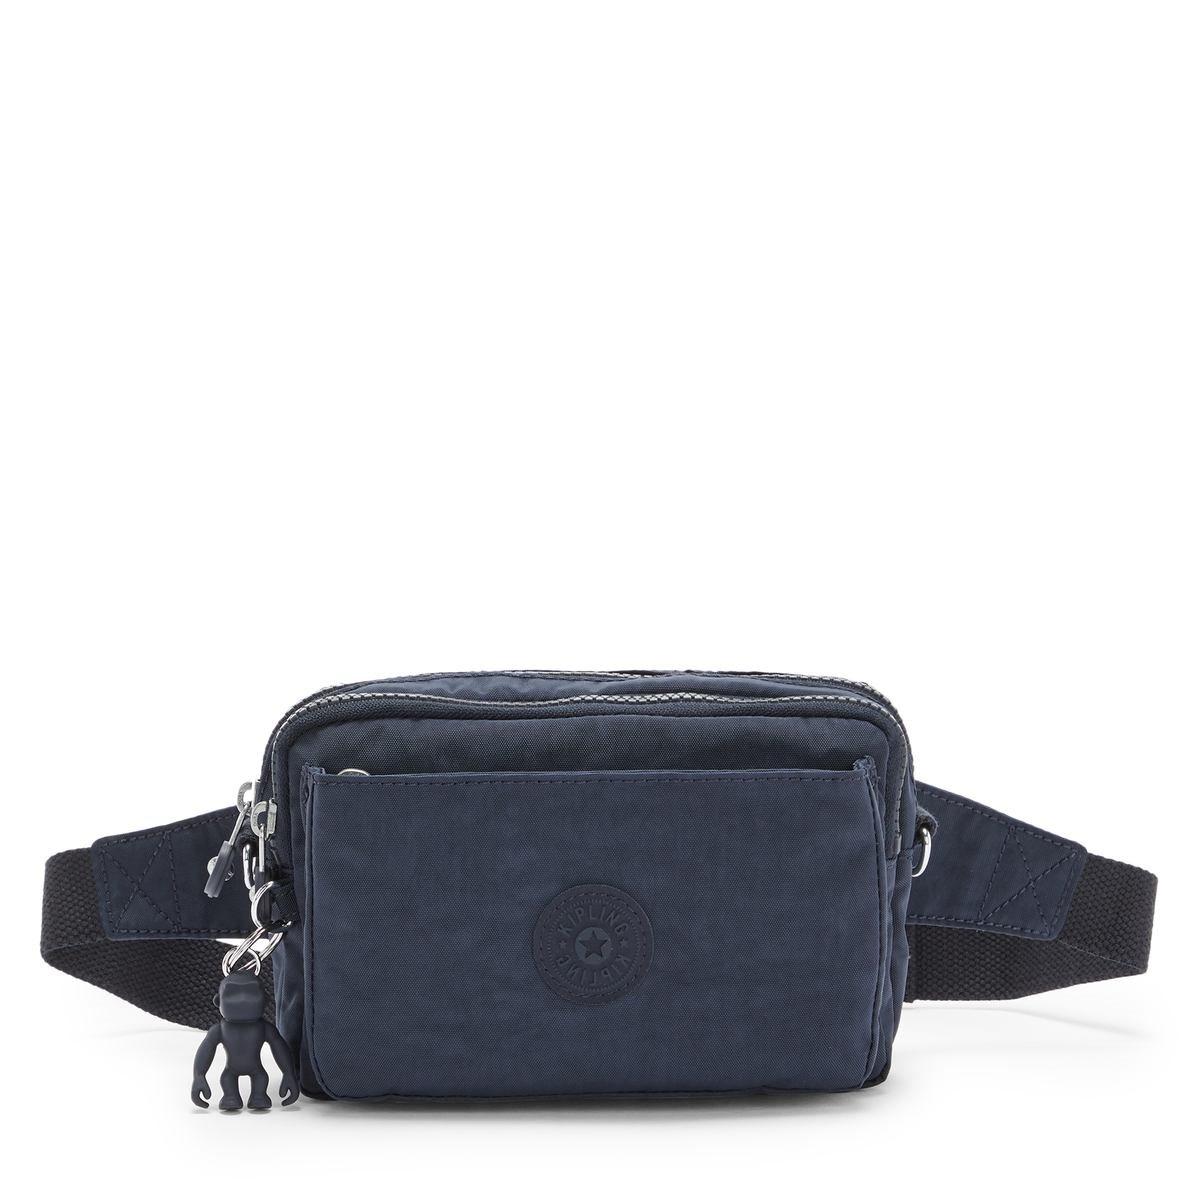 Kipling Τσάντα Ώμου Crossbody19x13x3cm Abanu Mini Blue